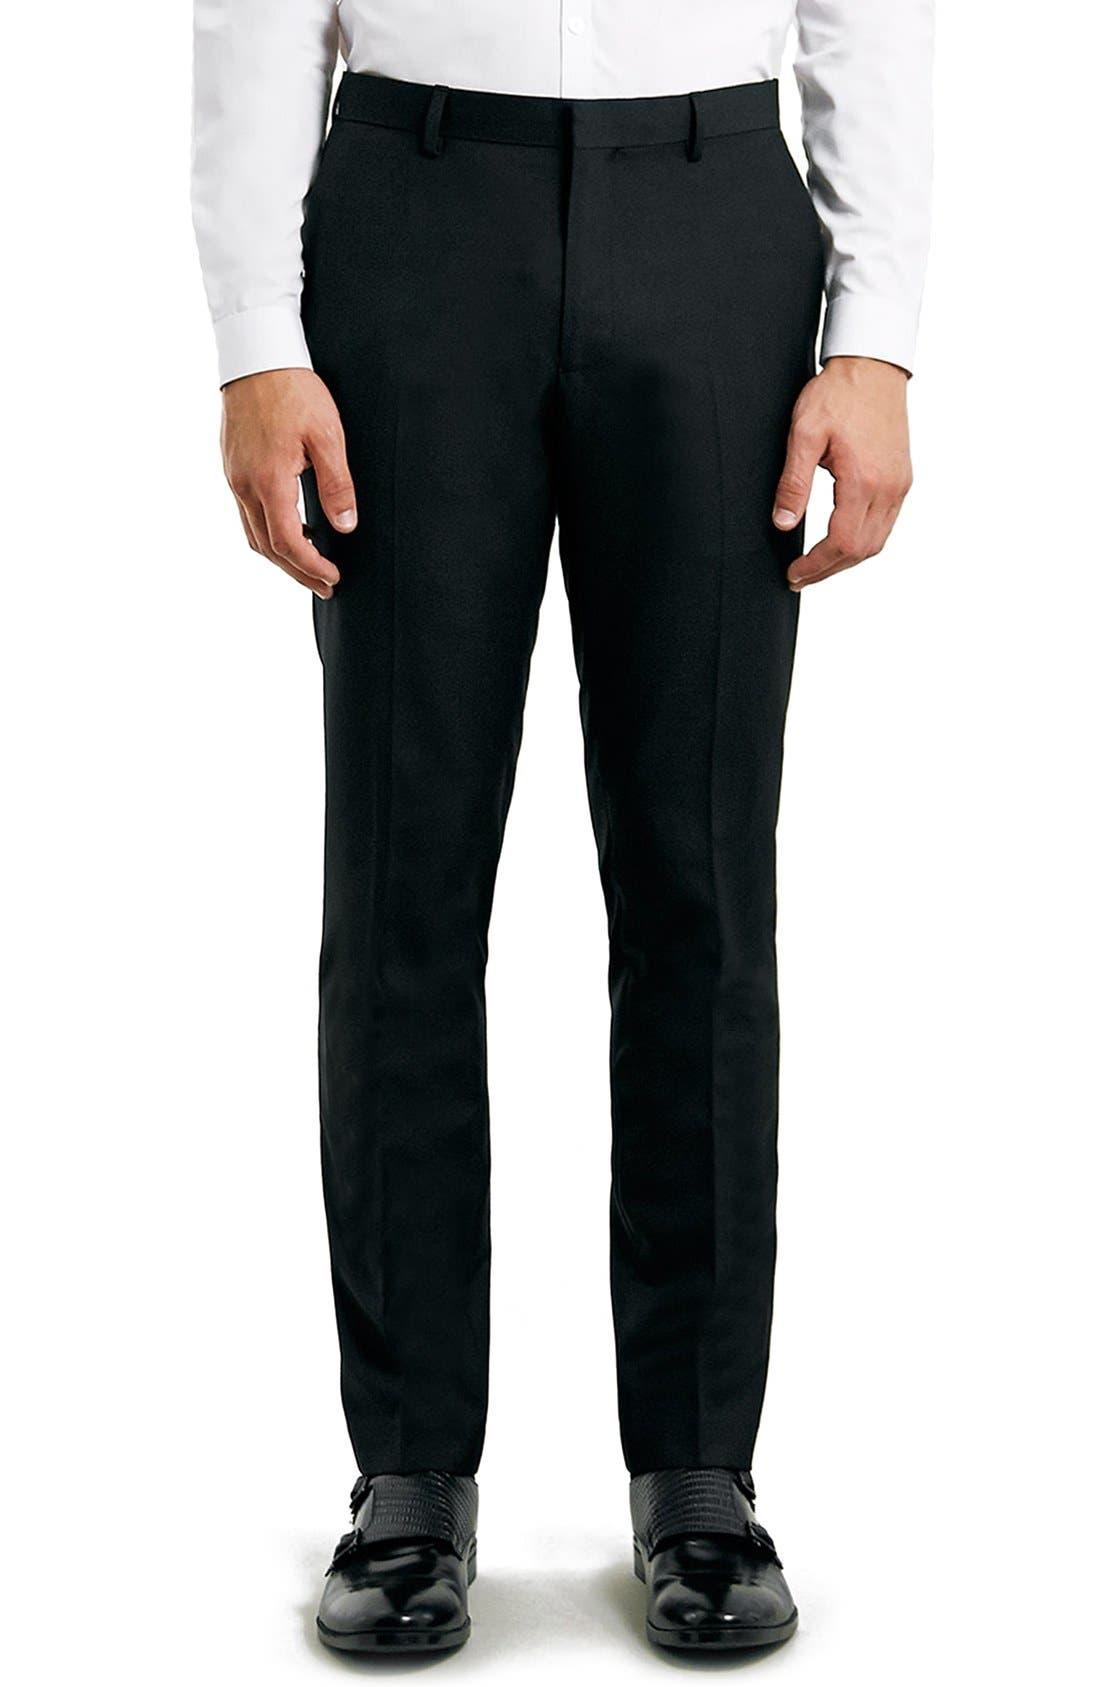 Topman Skinny Fit Black Suit Trousers